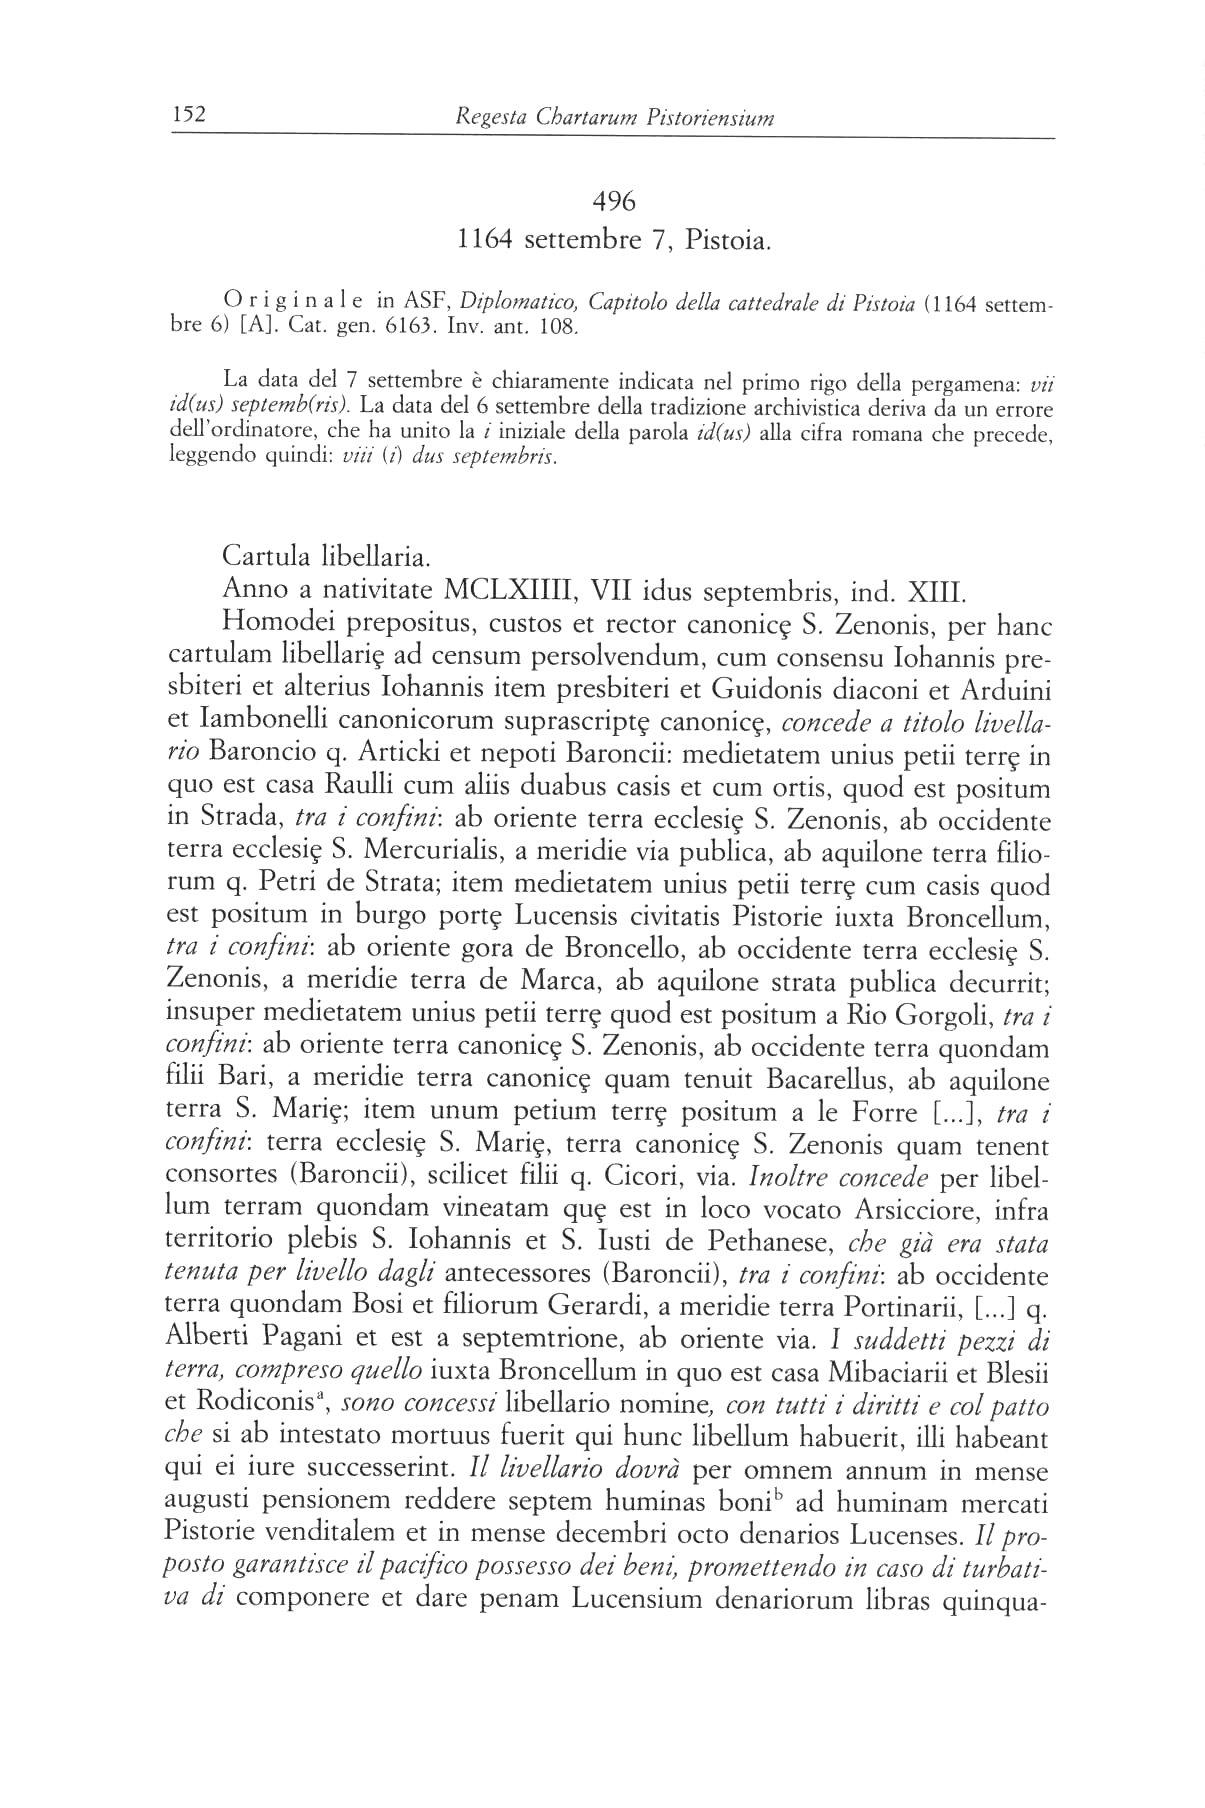 Canonica S. Zenone XII 0152.jpg